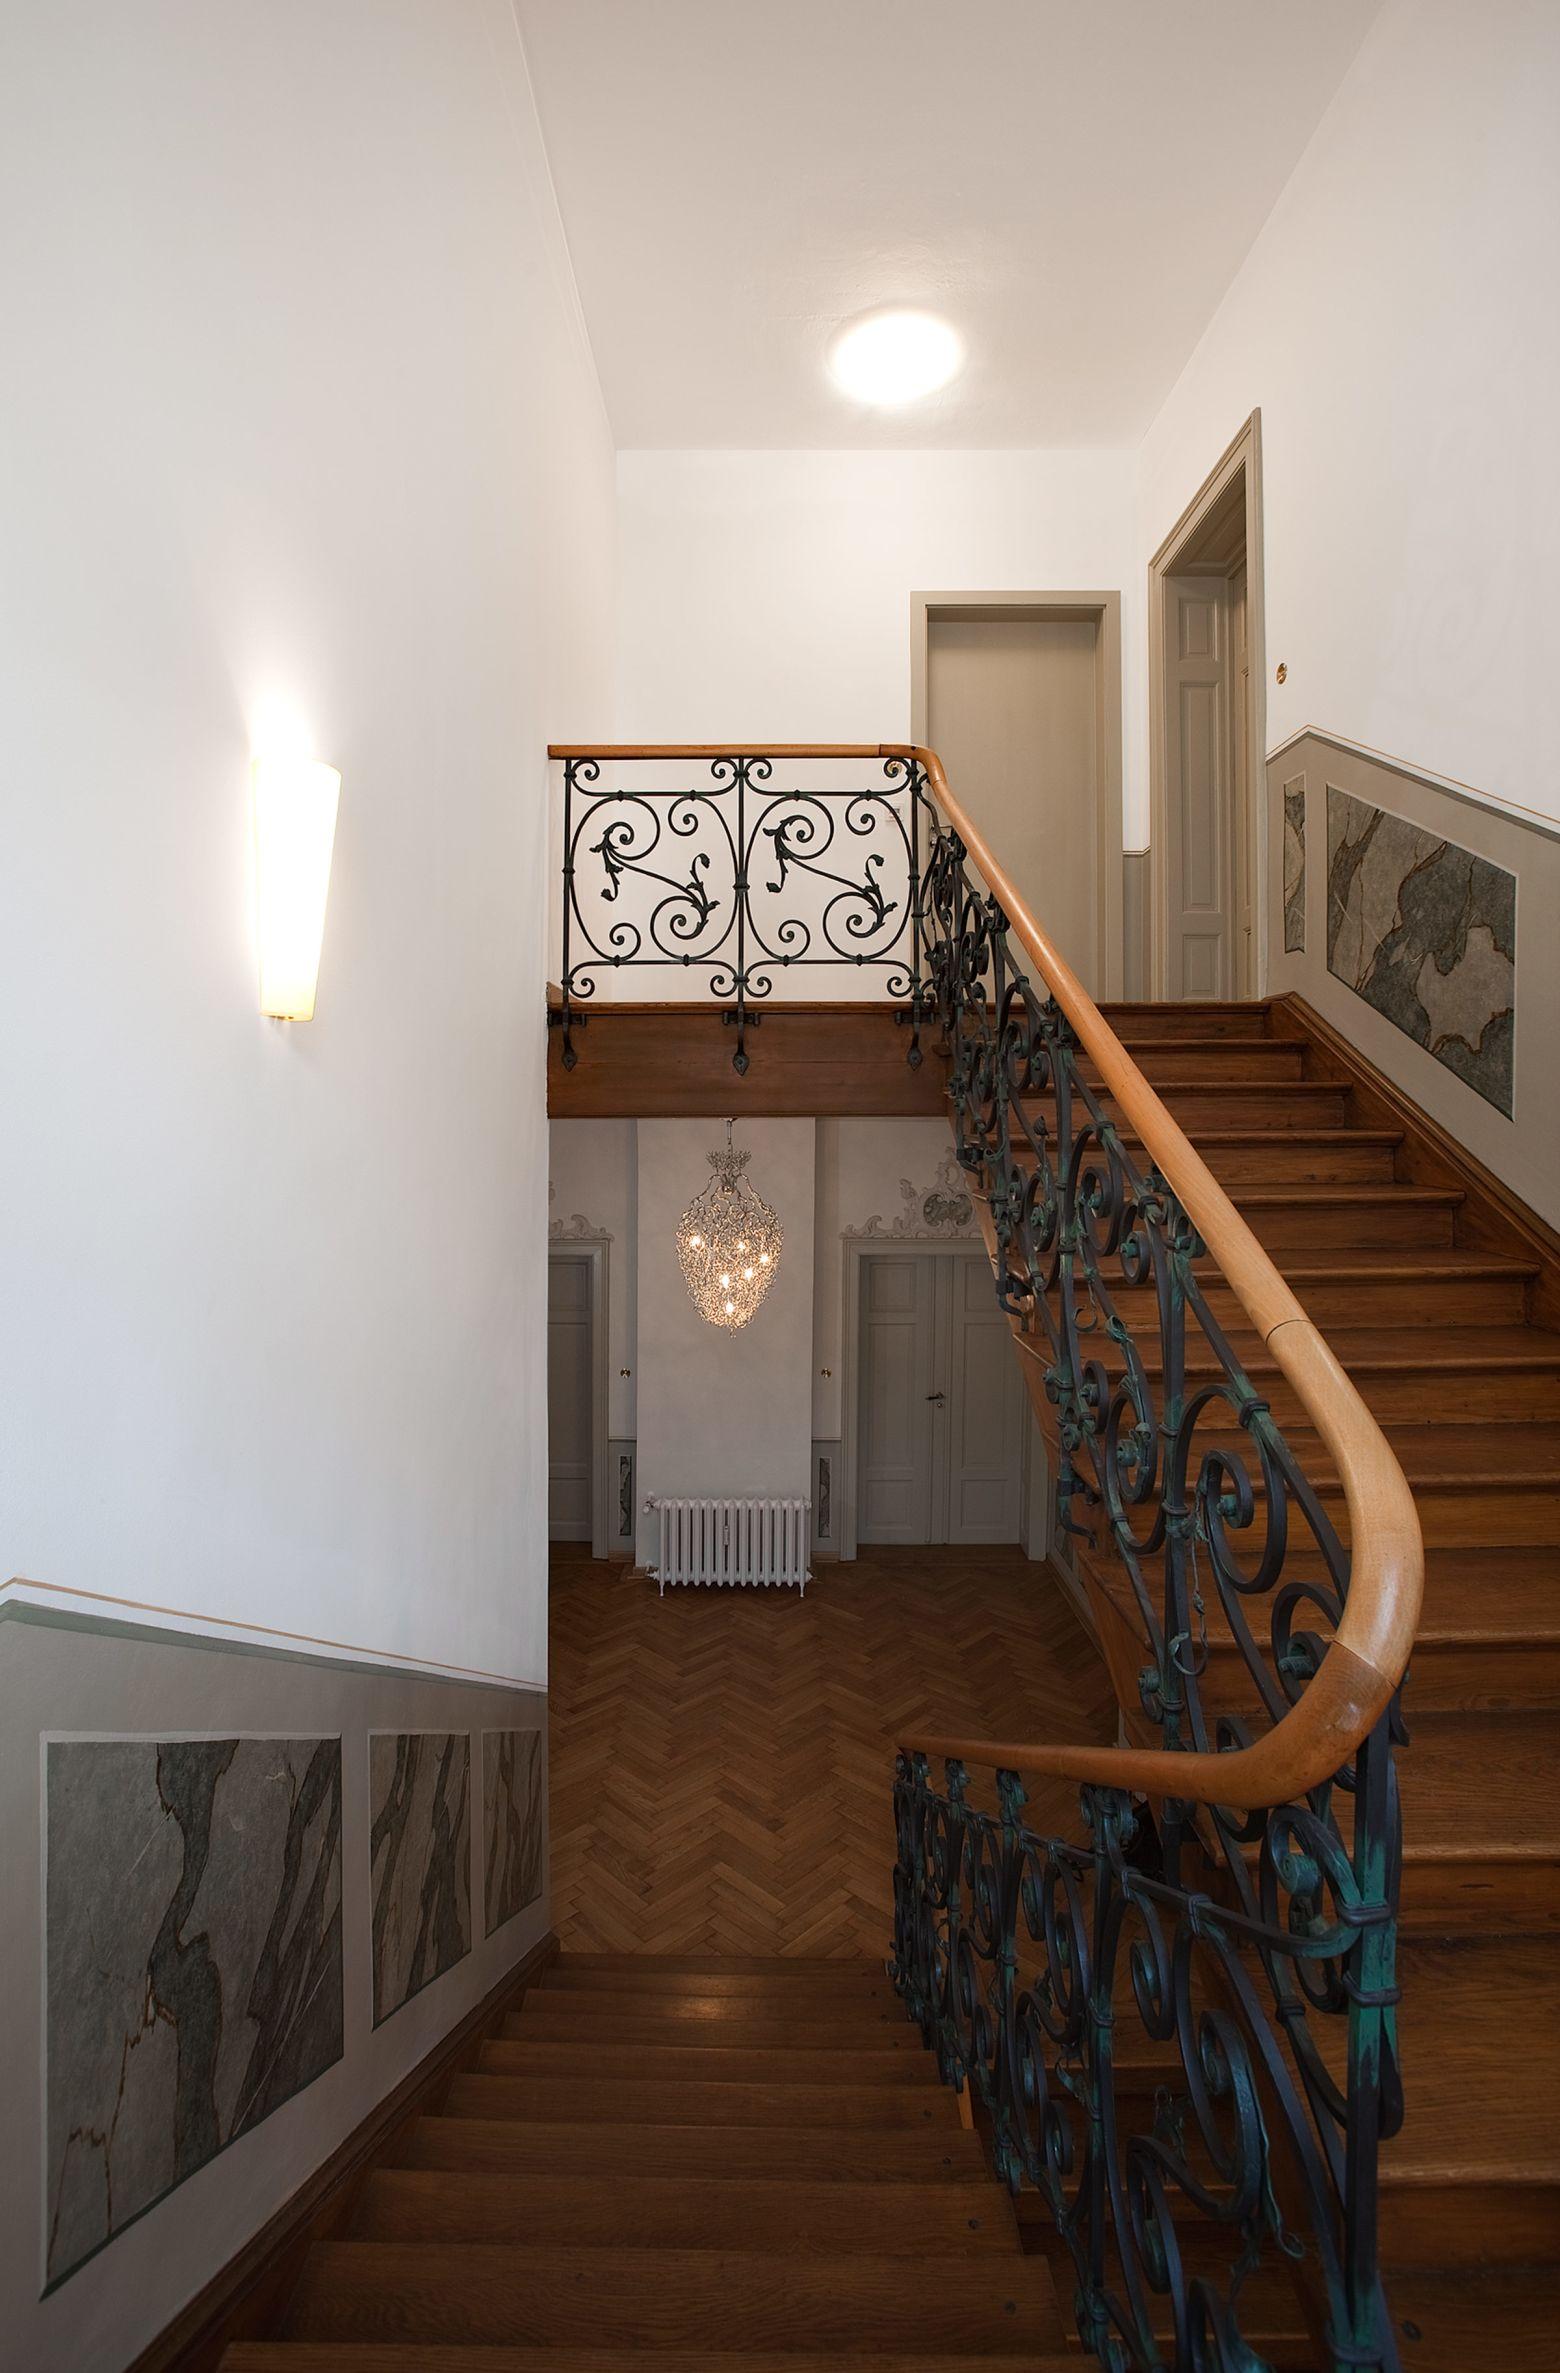 Treppenlauf zum Dachgeschoß